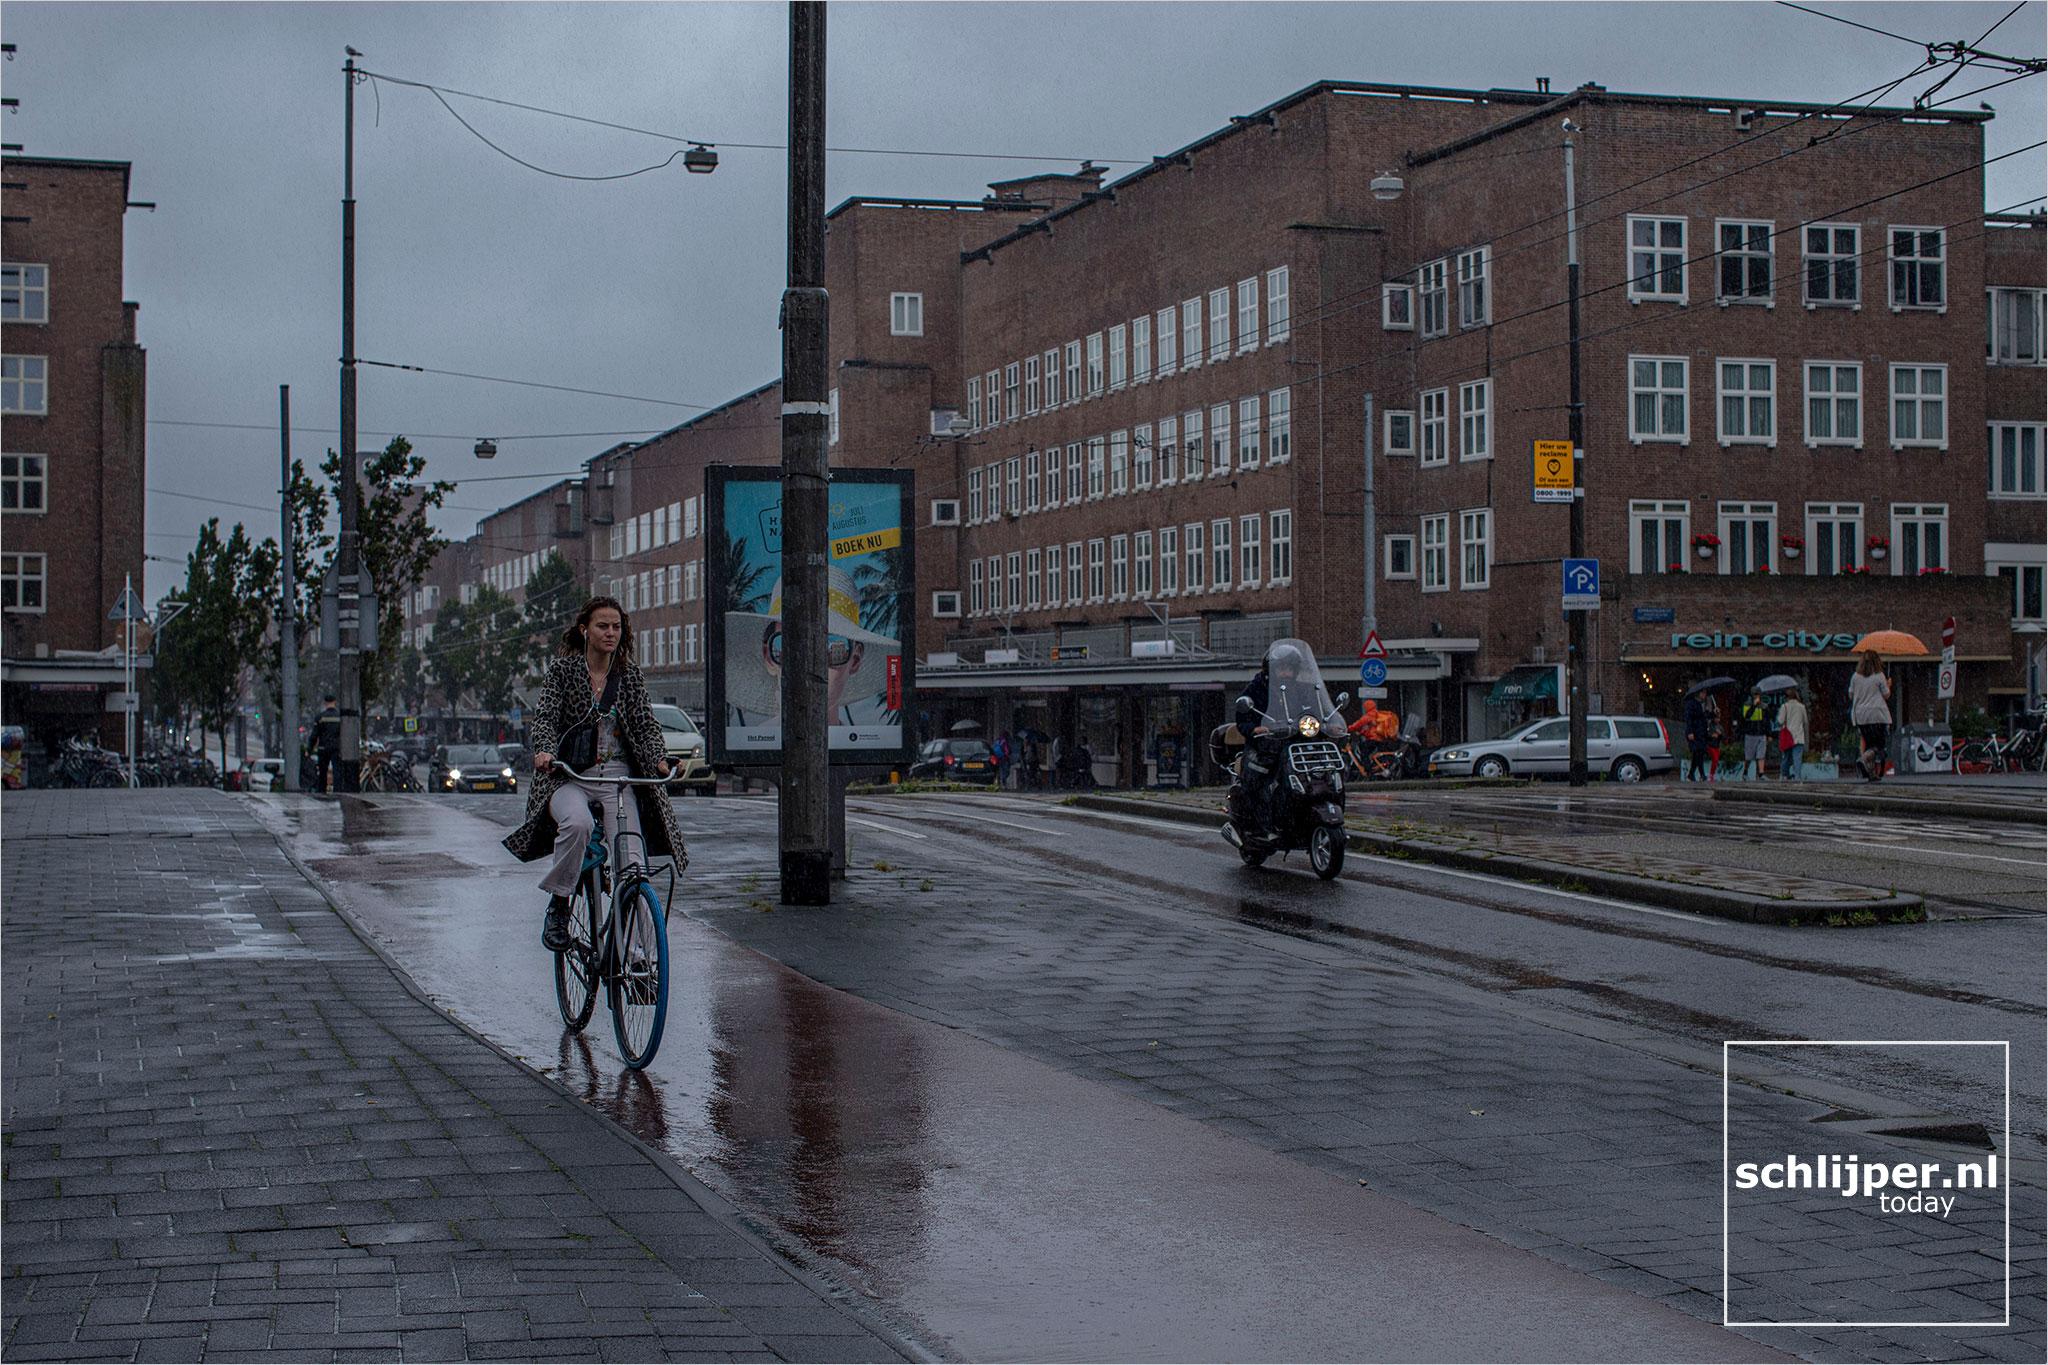 Nederland, Amsterdam, 25 juli 2020